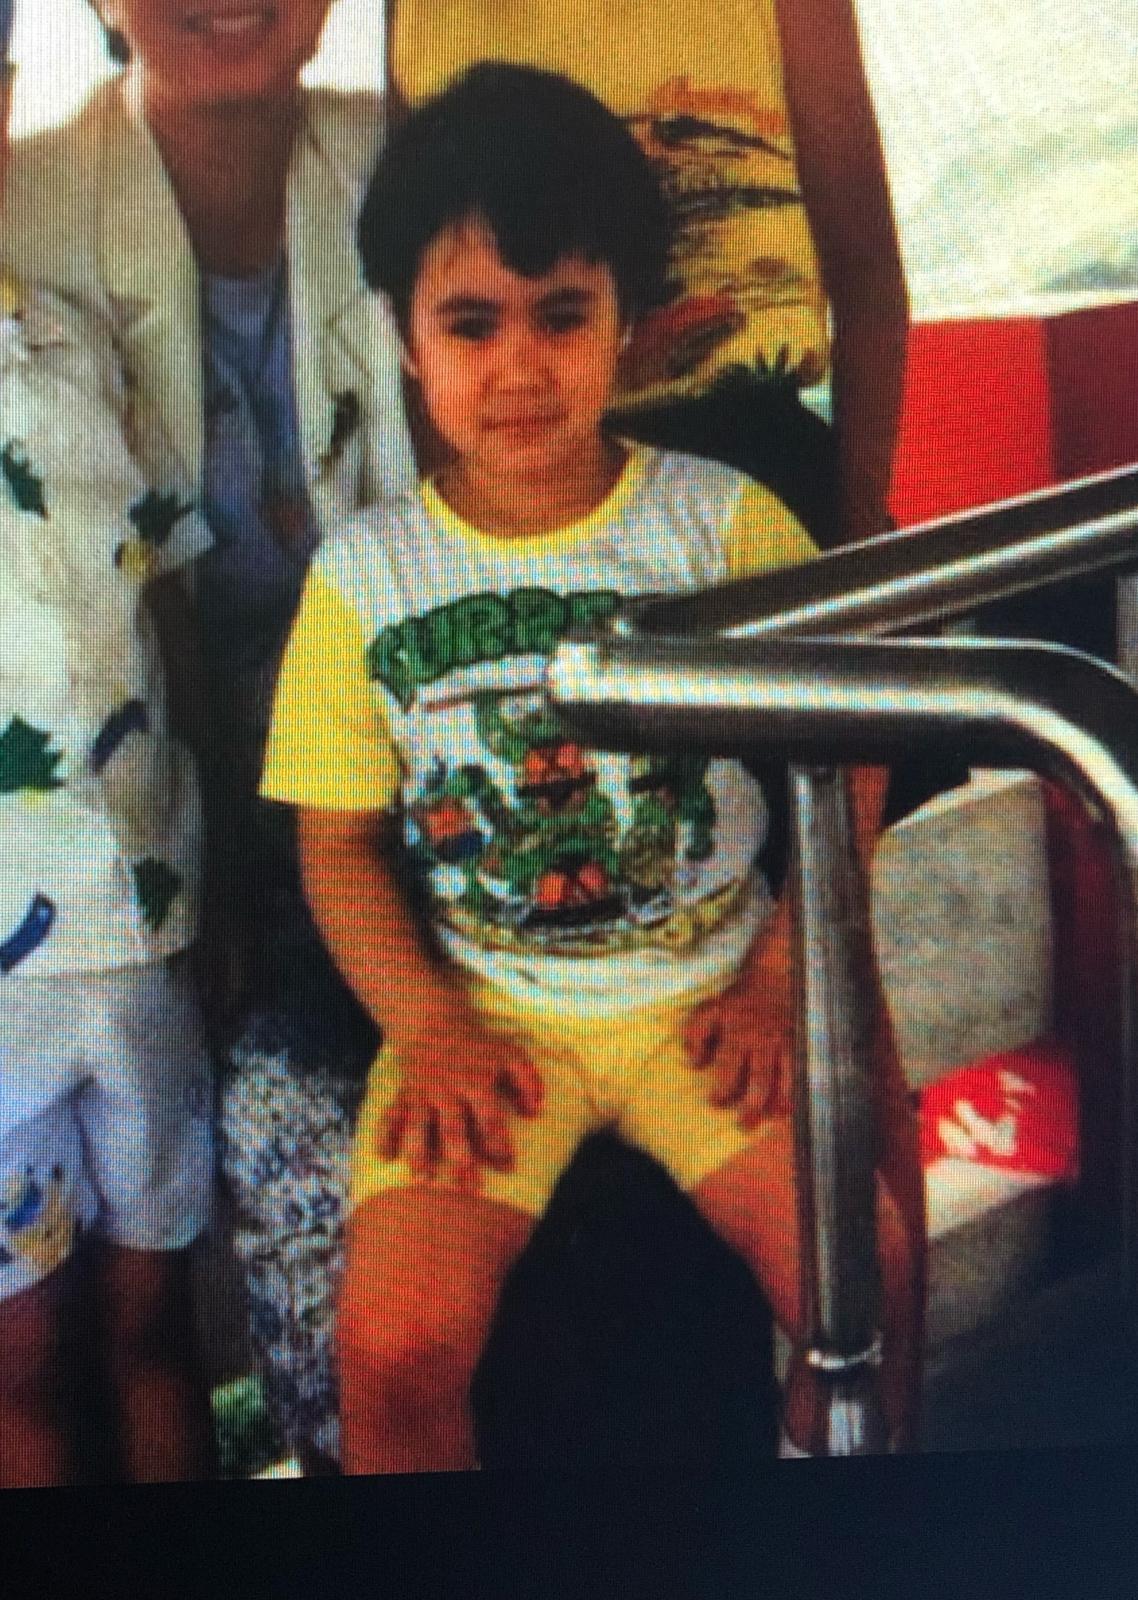 FLG at 5 years old.